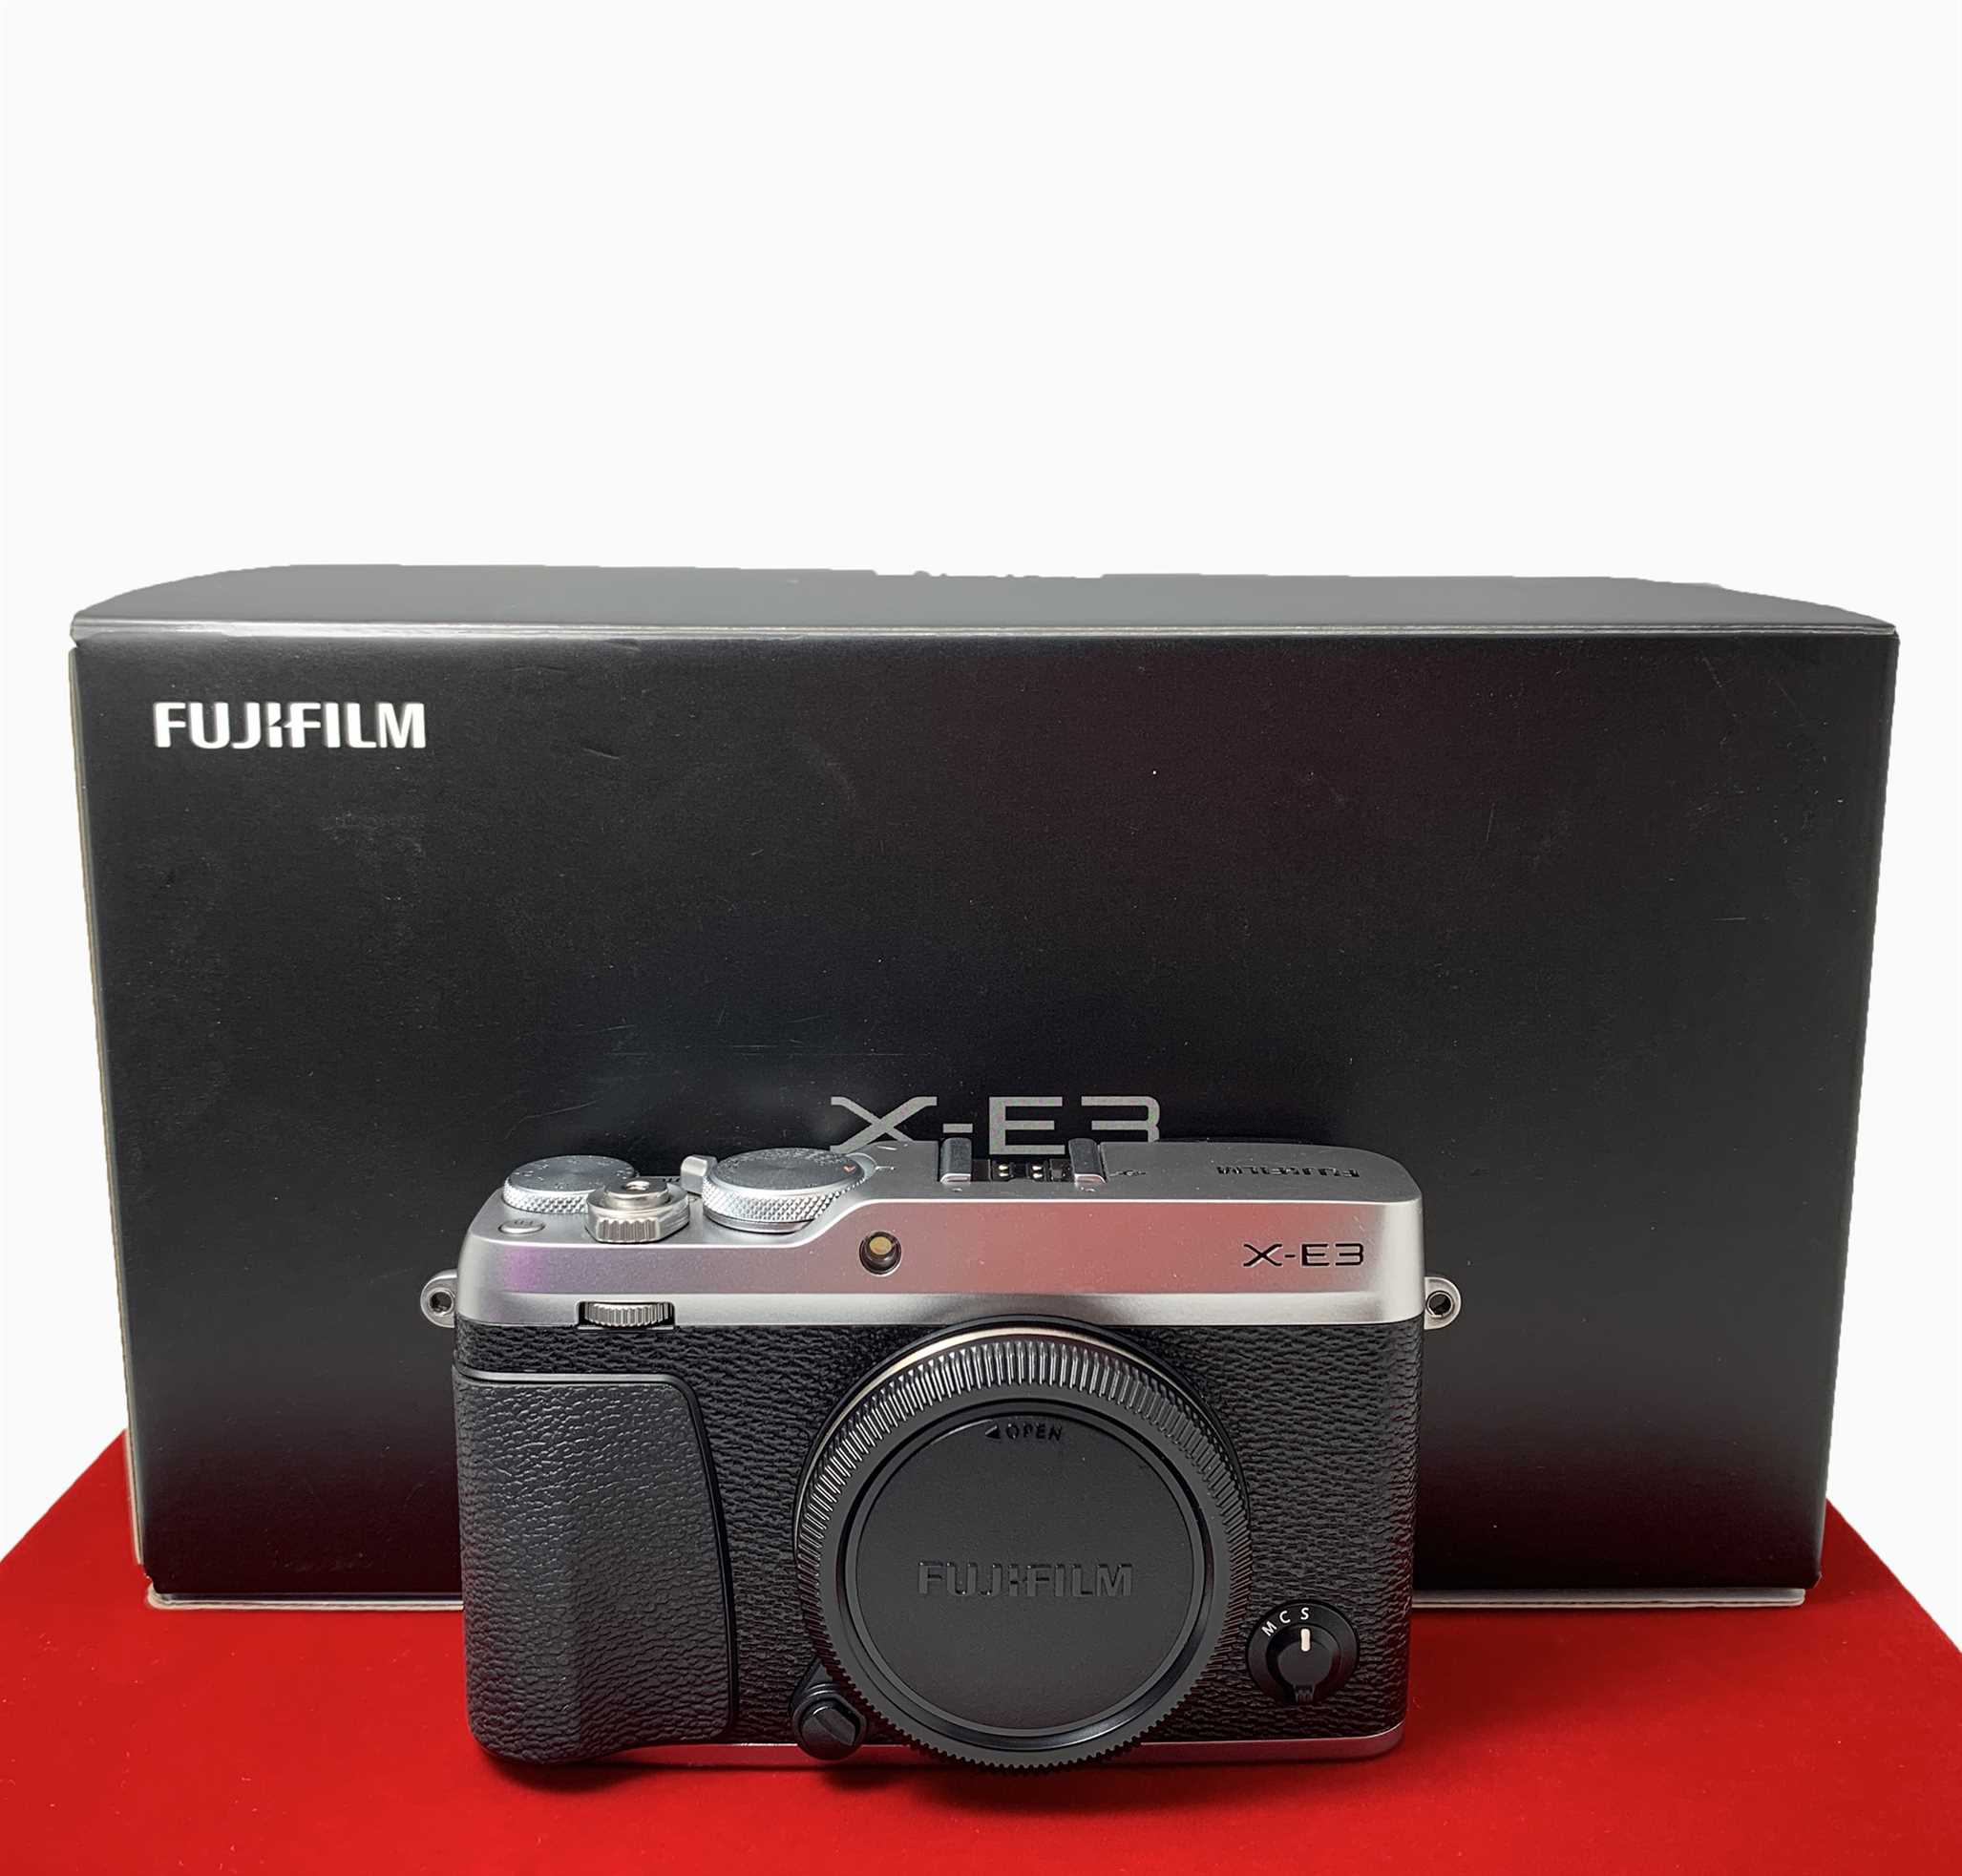 [USED-PJ33] Fujifilm X-E3 Camera Body (Silver),90% Like New Condition (S/N:7CQ07069)